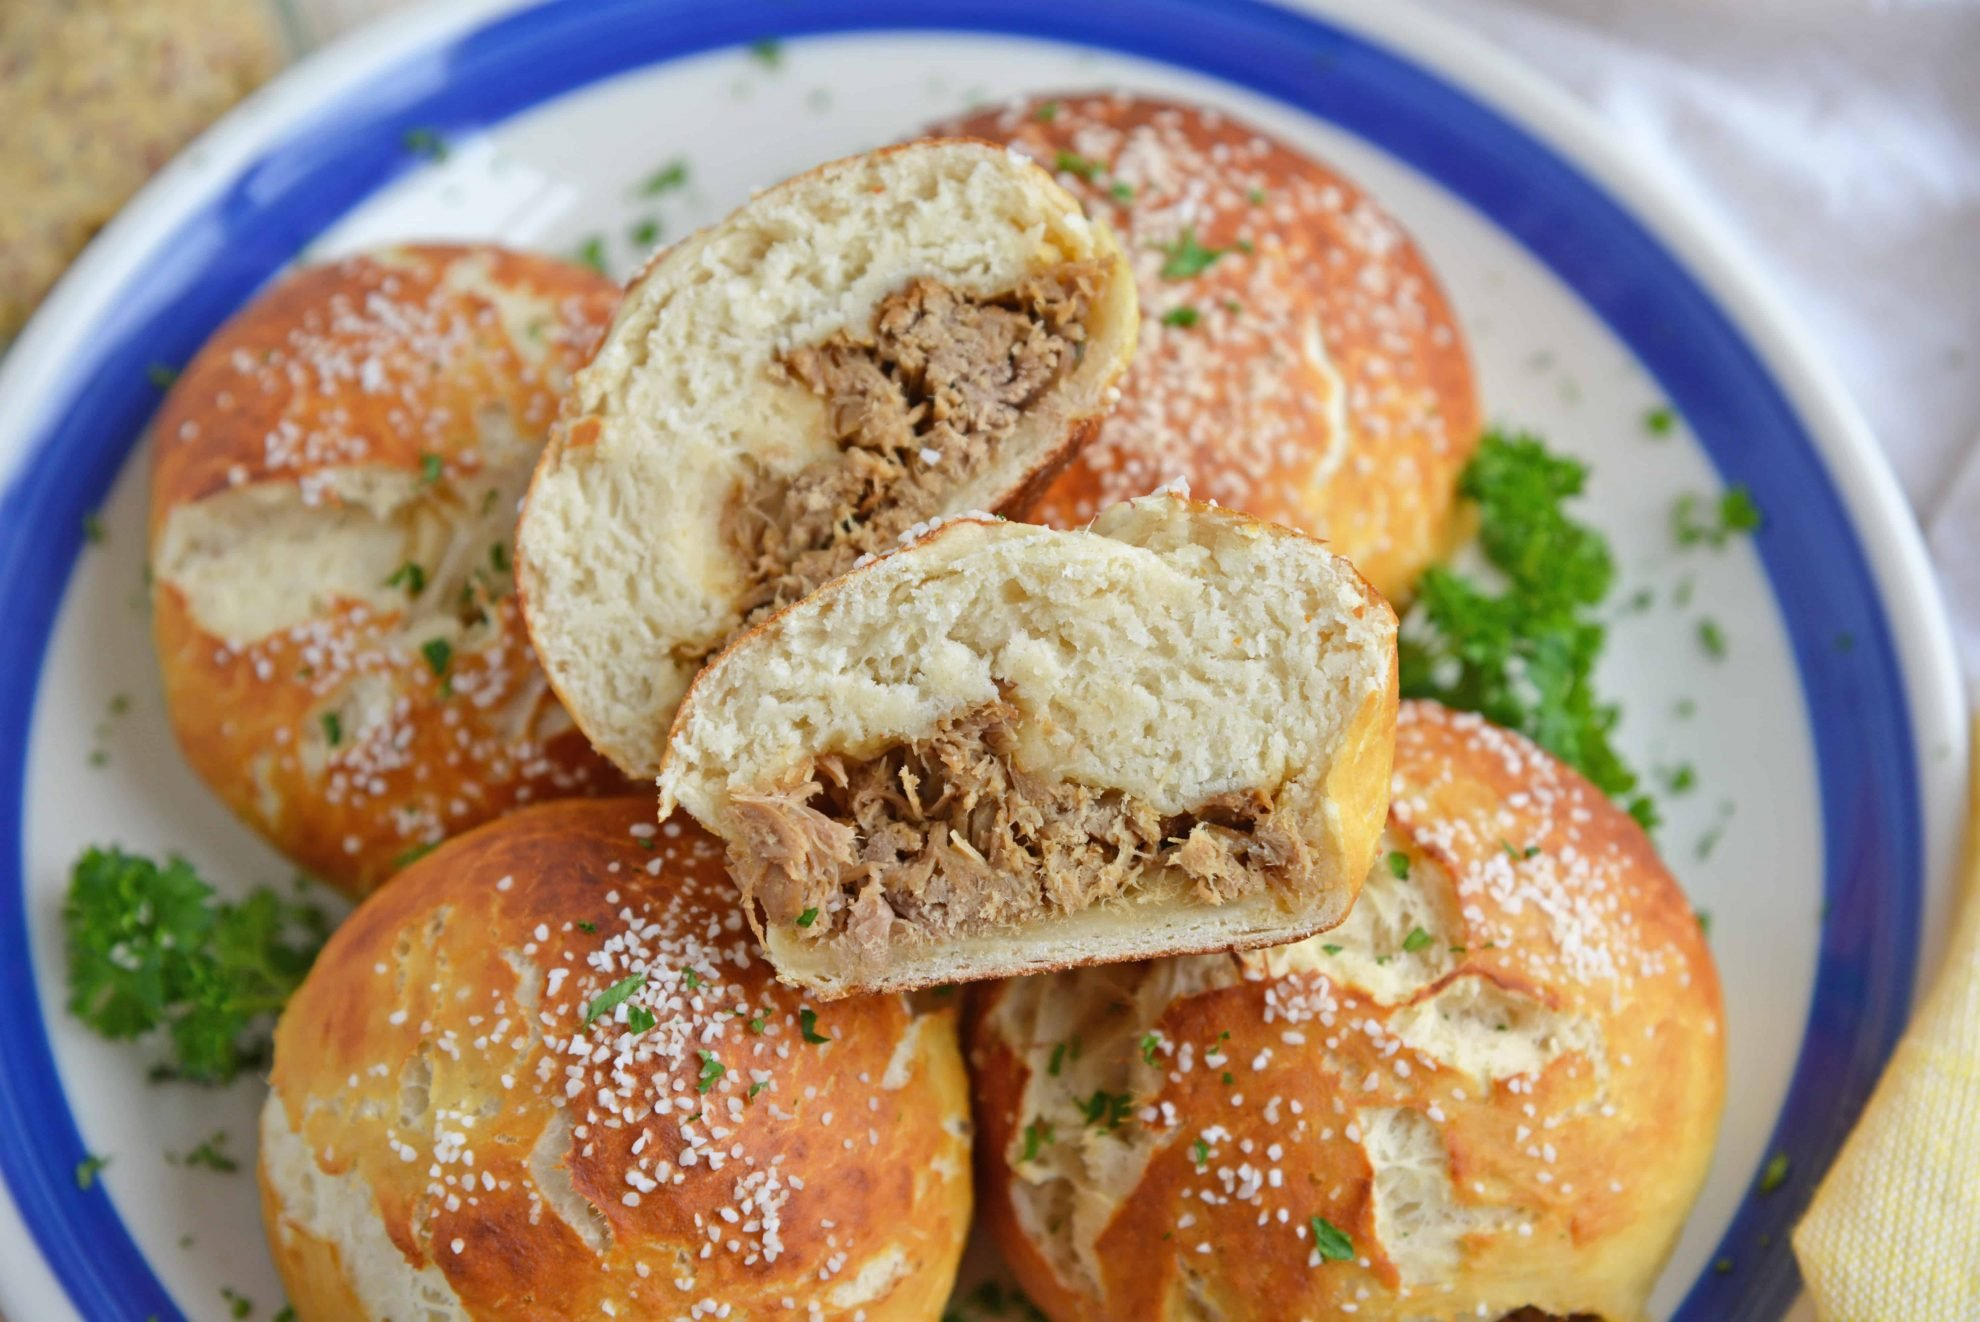 Platter of Pulled Pork Stuffed Pretzel Rolls